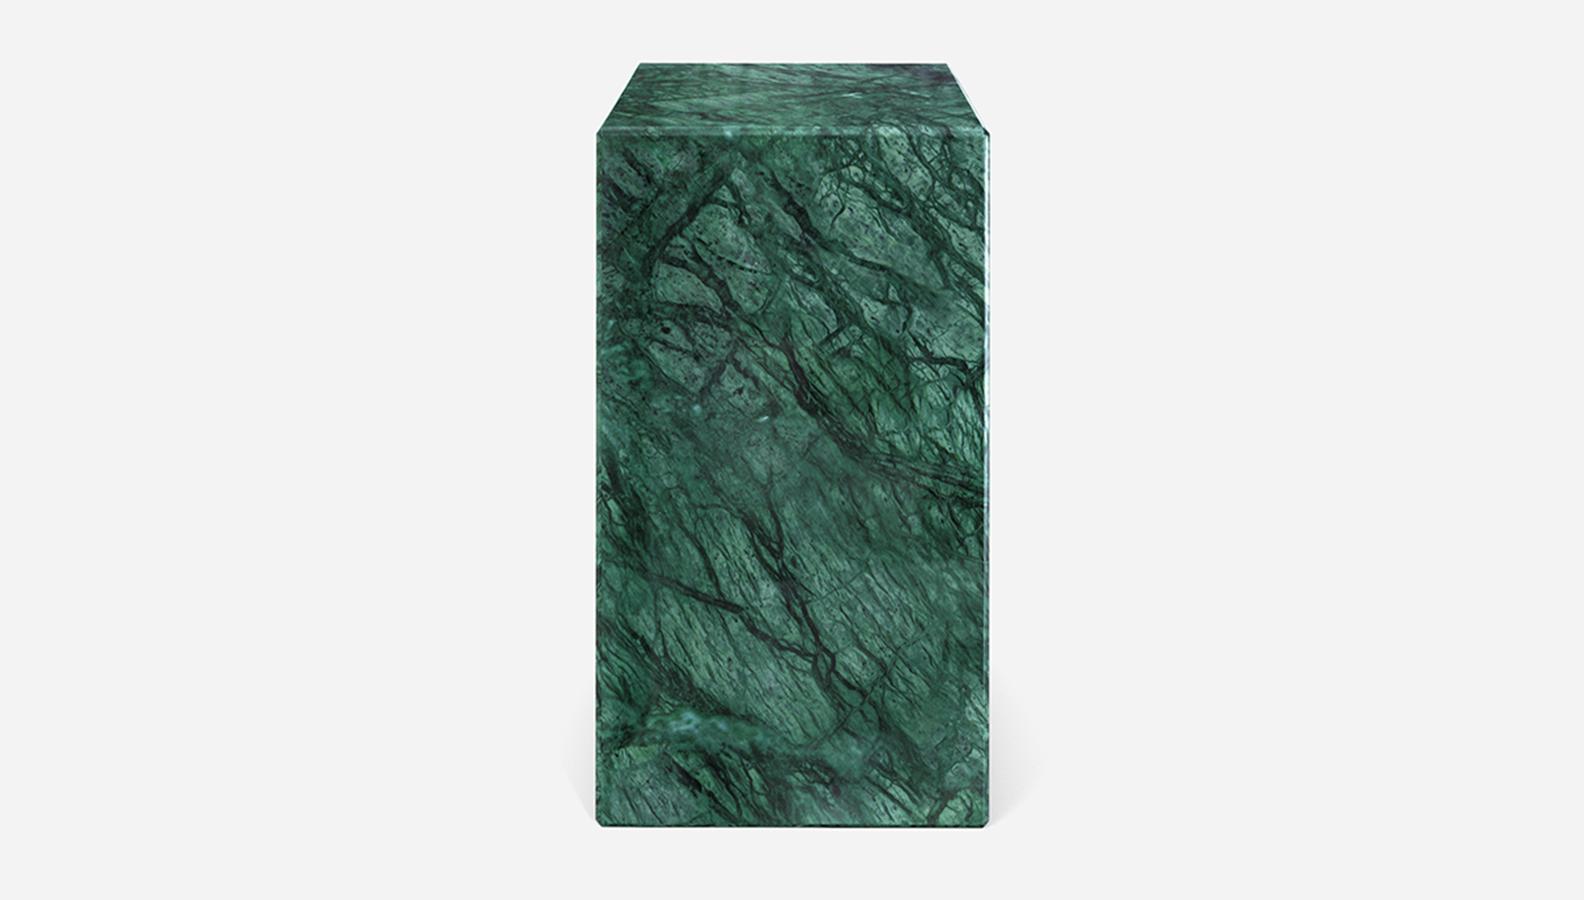 Aime Té Marmerblok Pilaar - India Green - 30  x 30  x 51